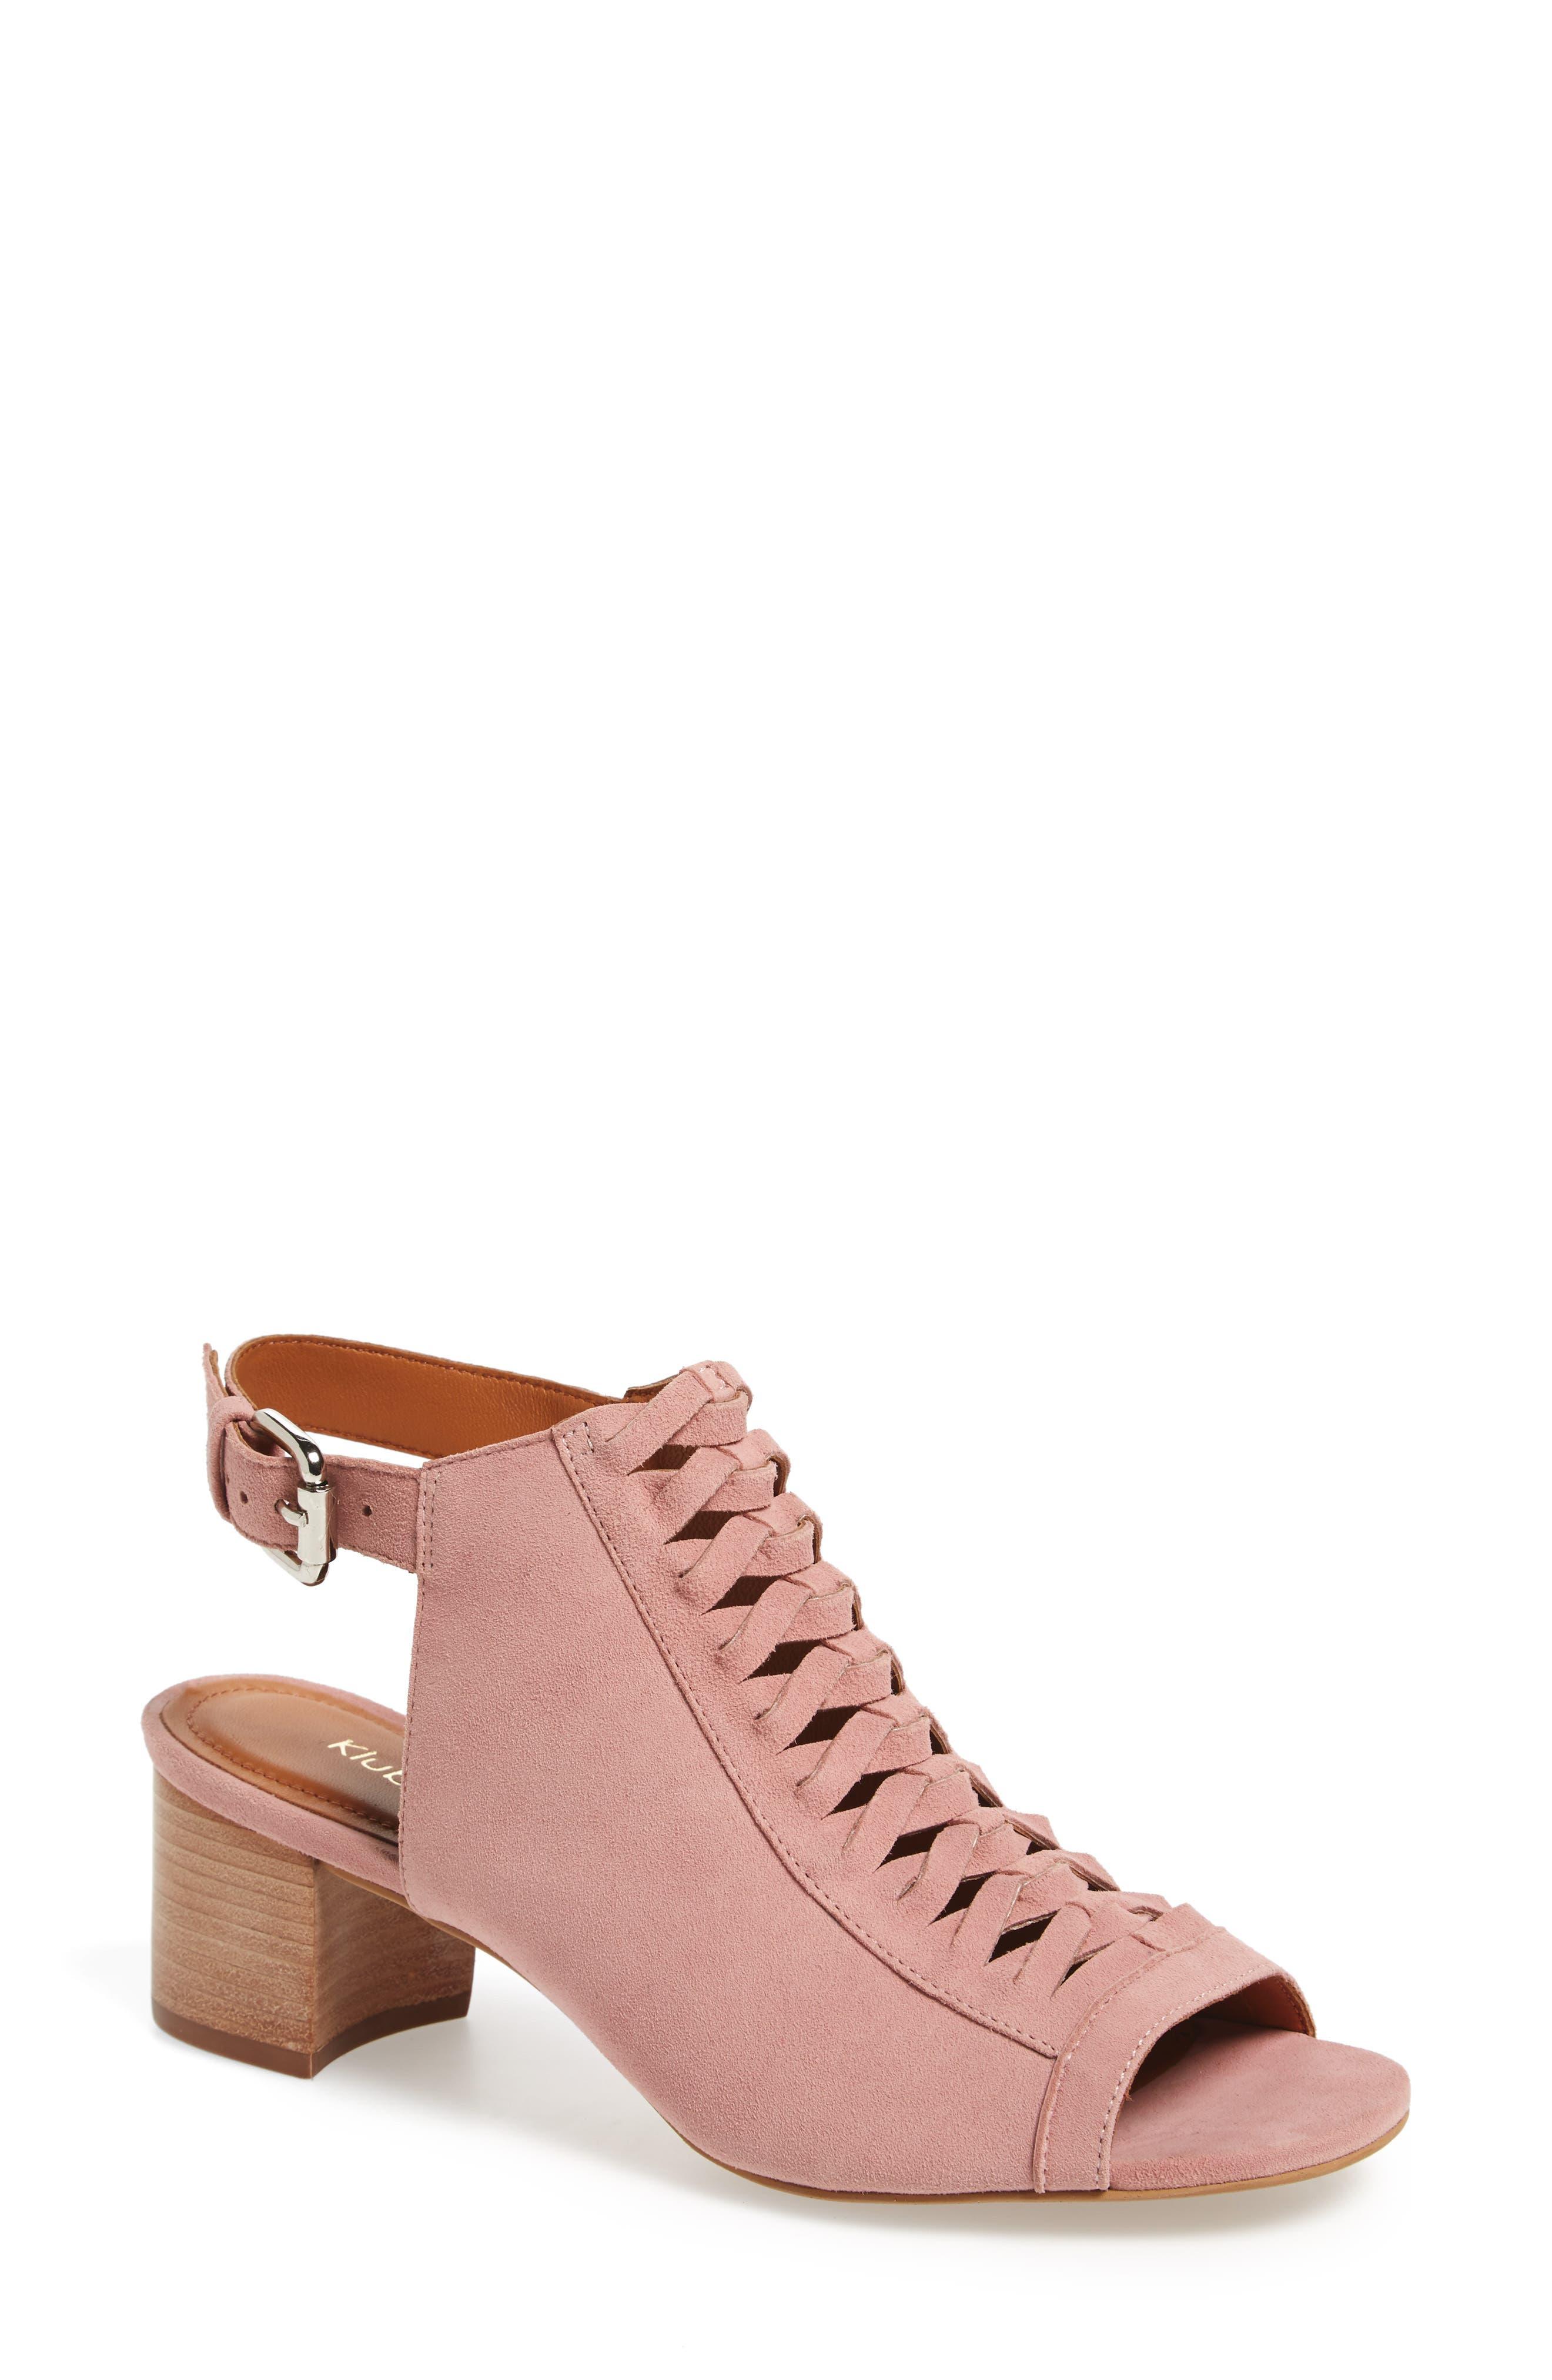 Dallas Woven Sandal,                         Main,                         color, Blush Suede